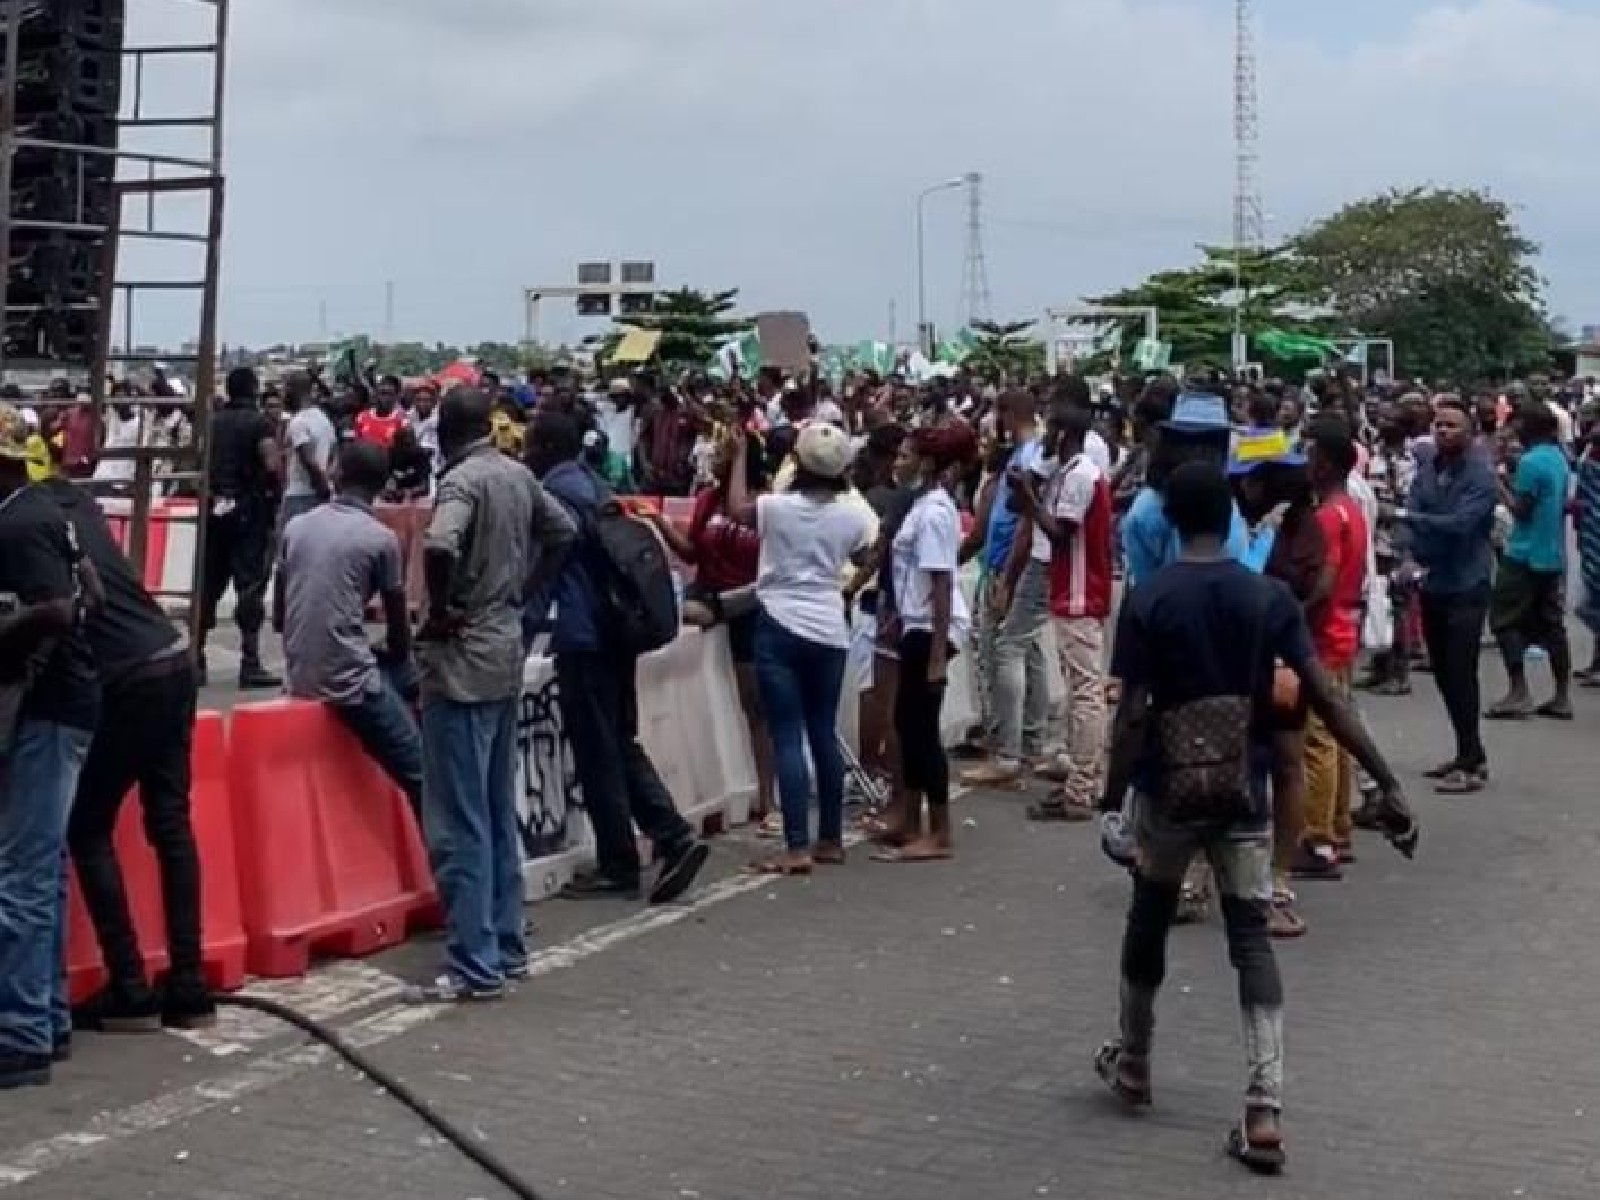 Lekki Toll Gate Killings: How Nigerian leaders send wrong signals